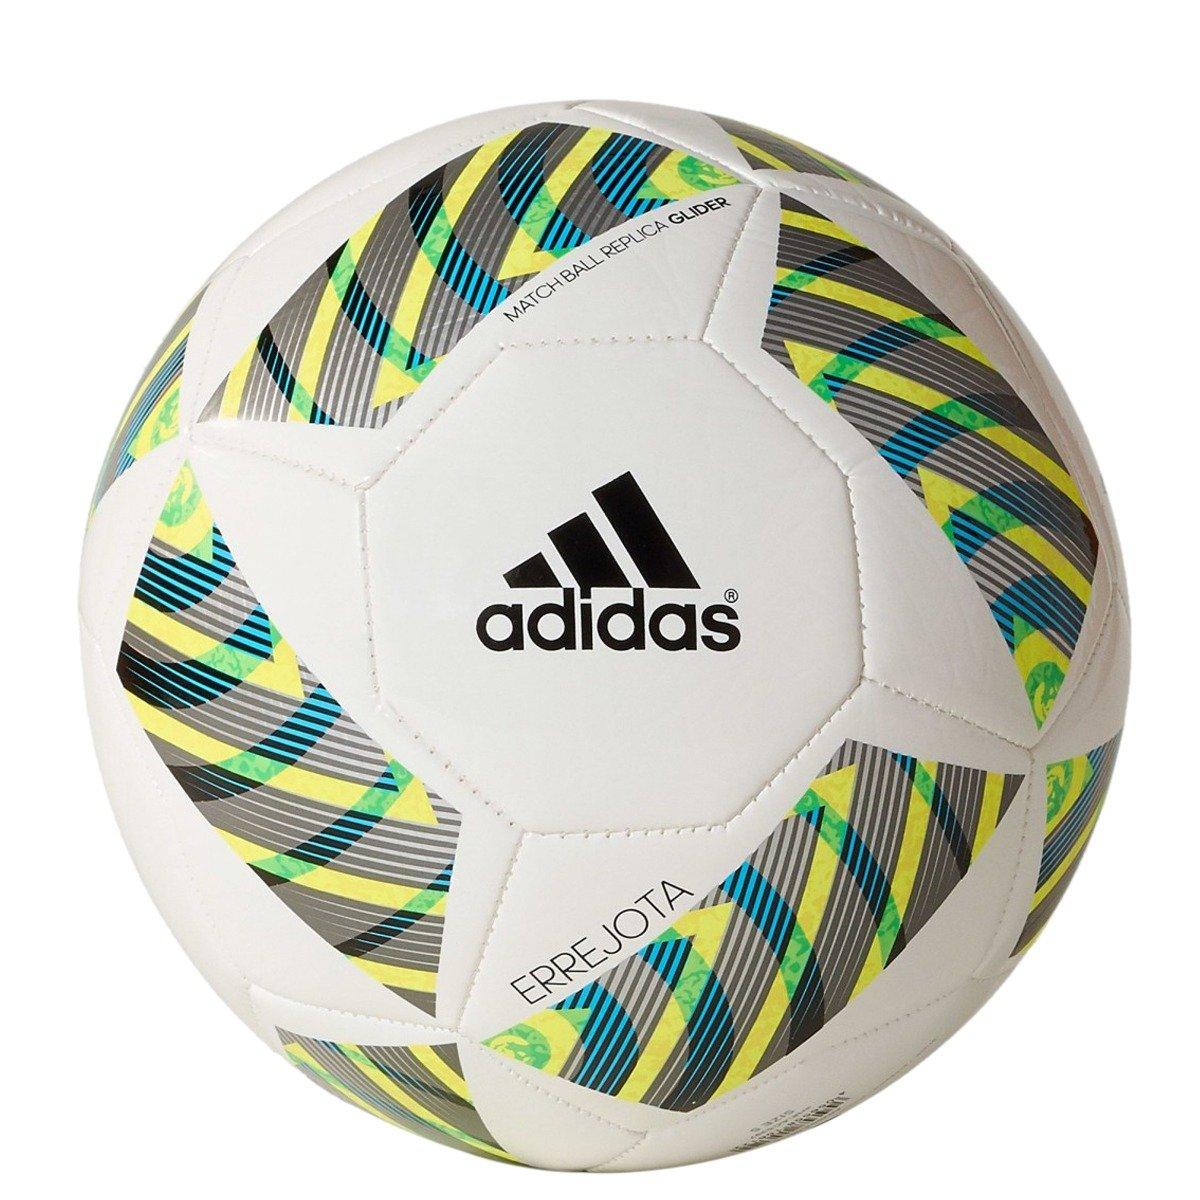 Bizz store bola futebol de campo adidas fifa glider jpg 1200x1200 Bola  adidas 2734818372f75